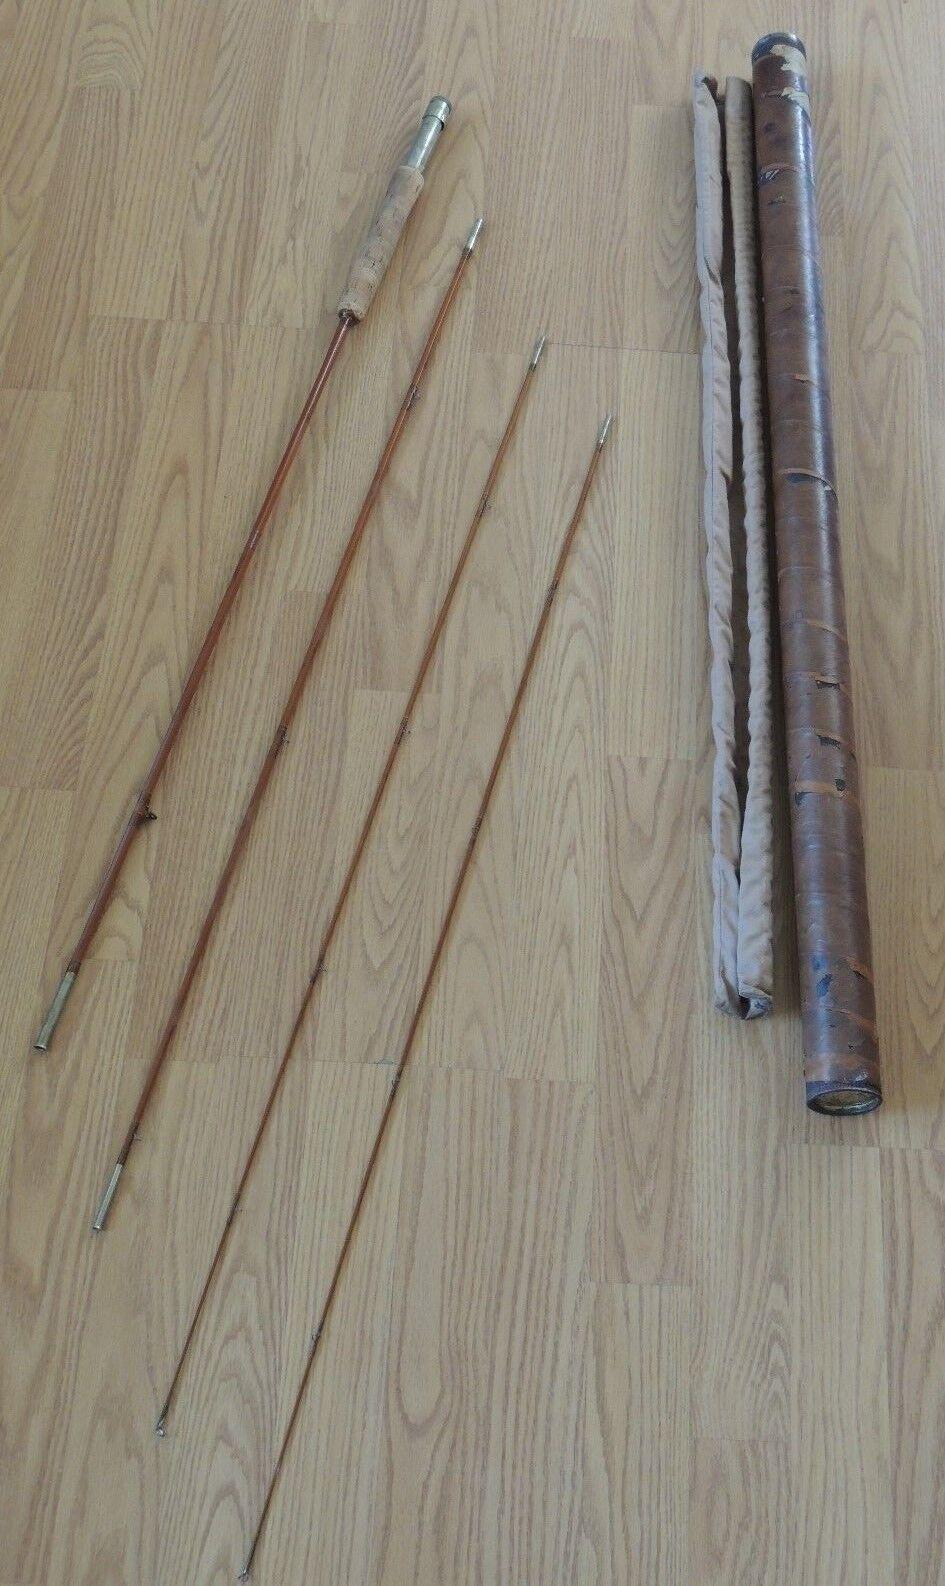 Wright & McGill Granger victoria de bambú Fly Rod 9' WT 5 3 4 OZ